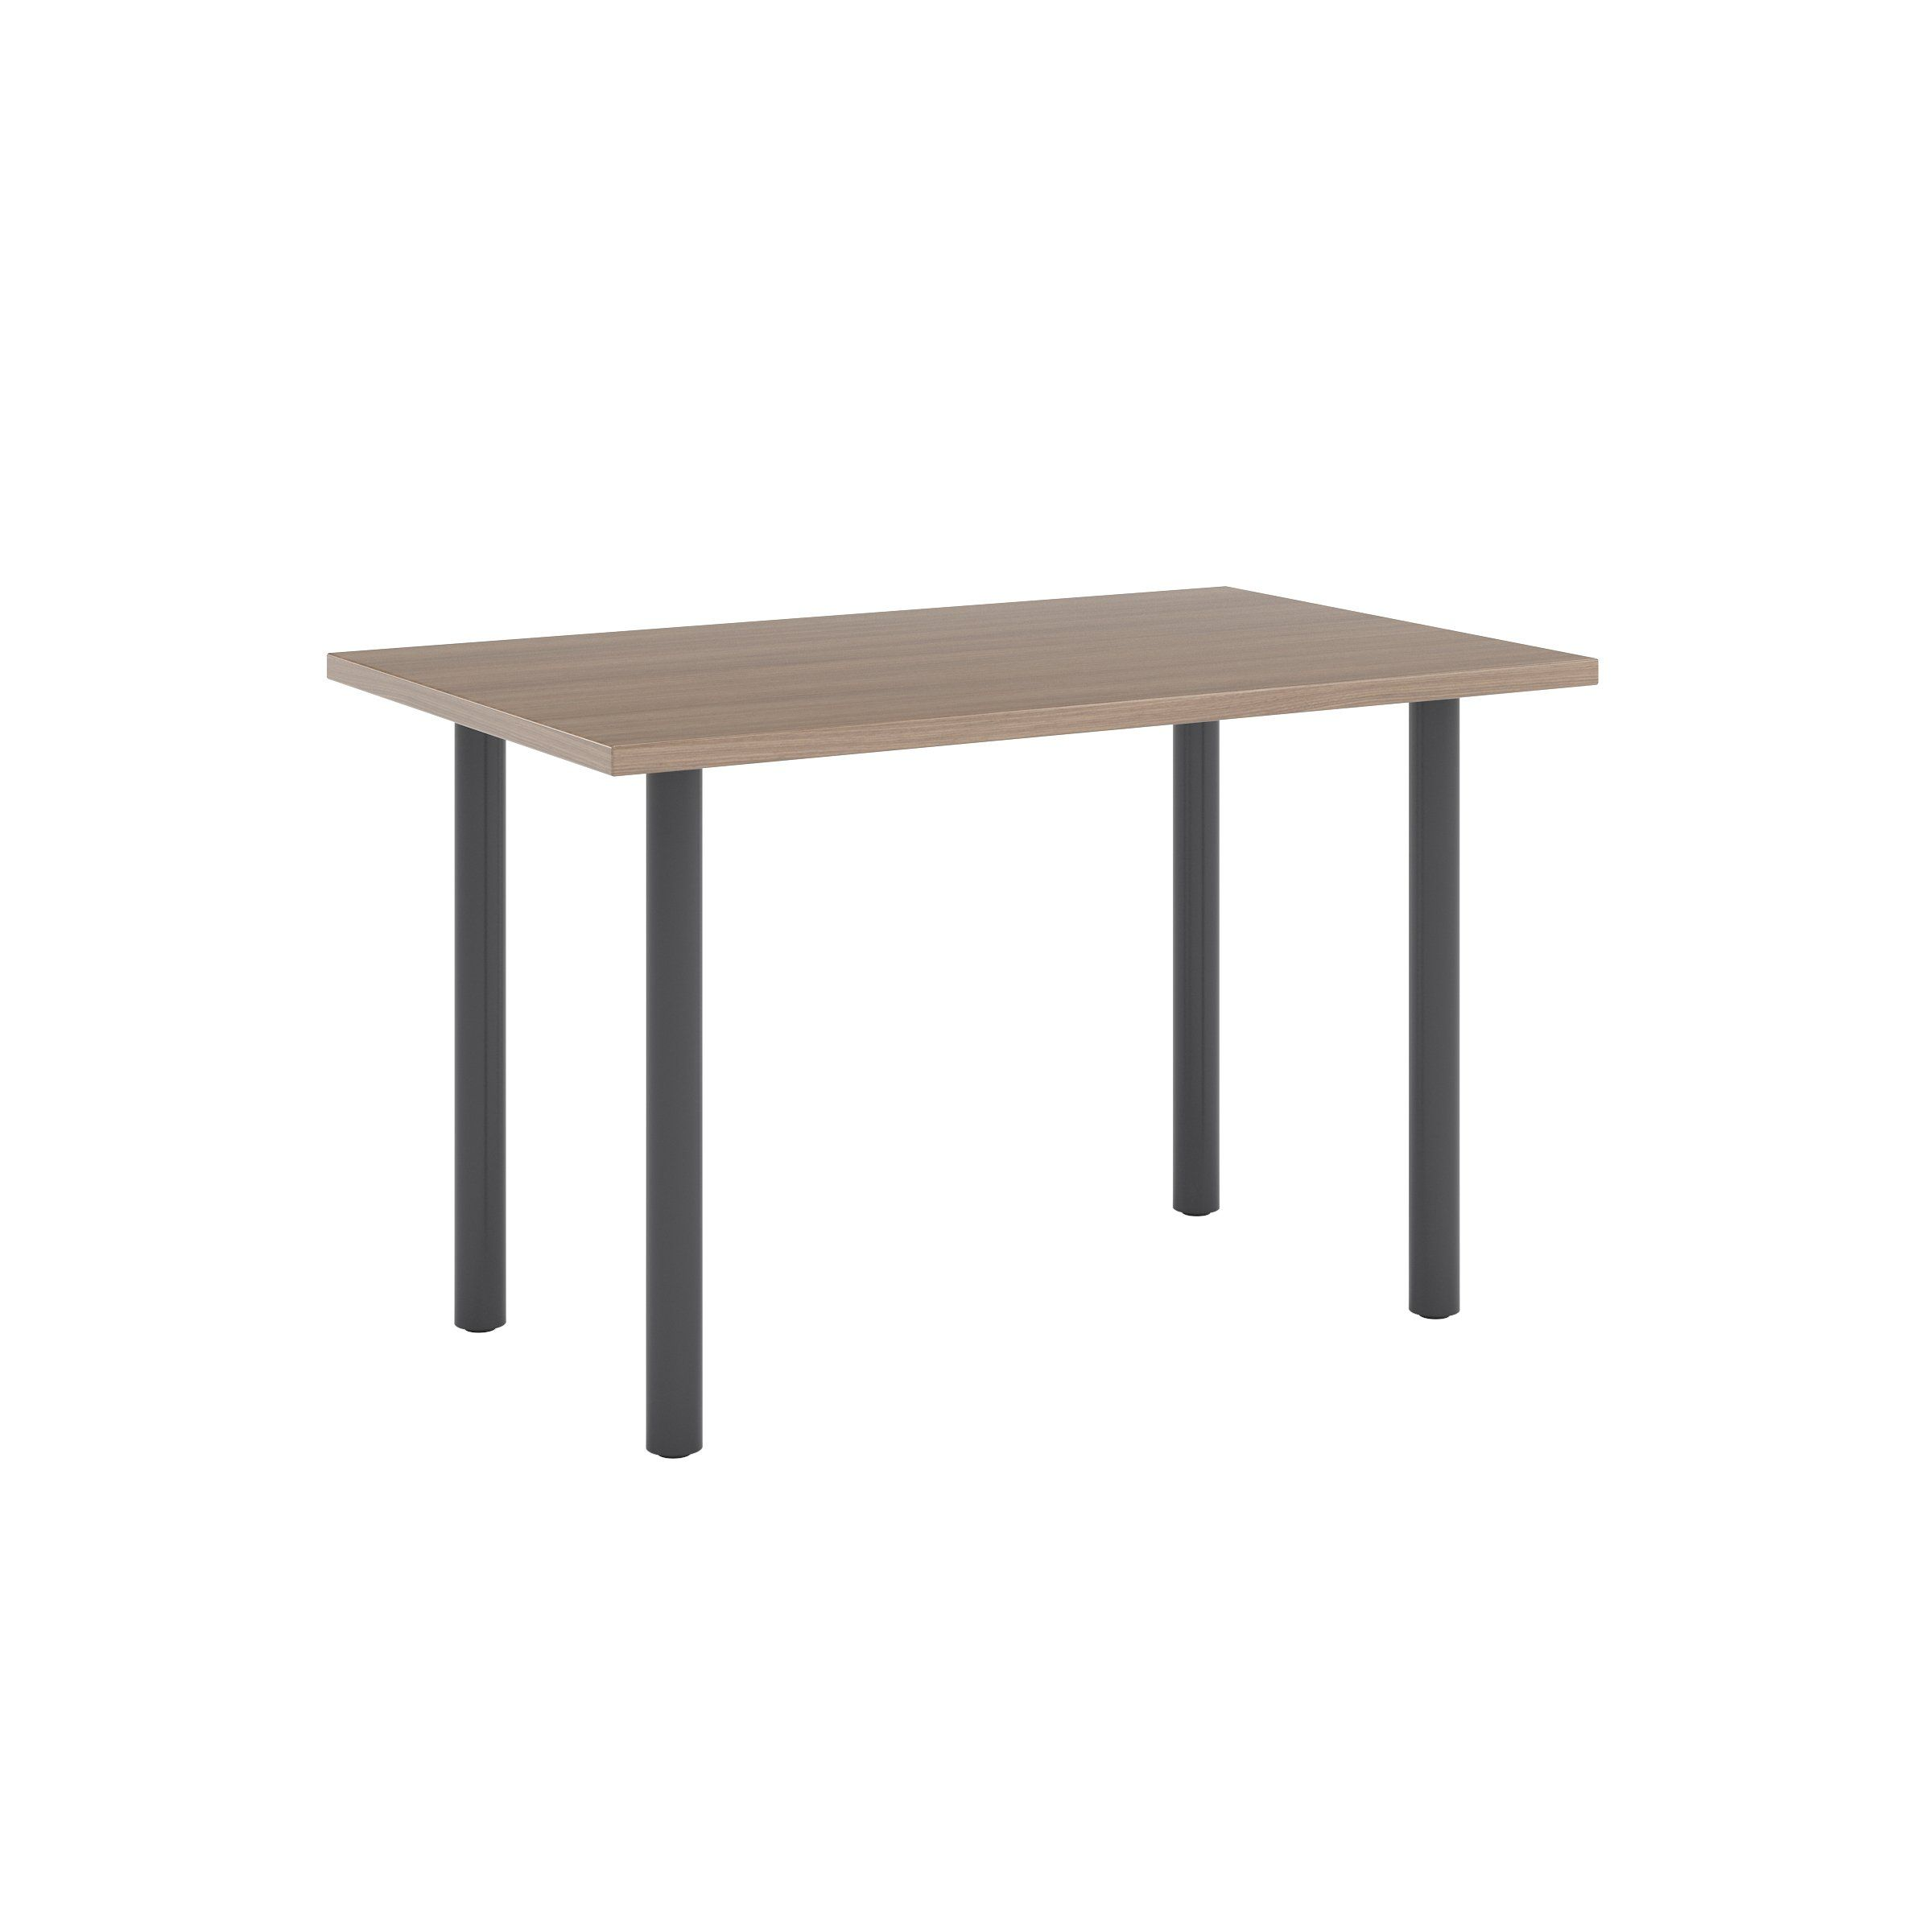 Photo of Jive Desk with Post Leg Base – 30D x 48W / Neo Walnut / Char…